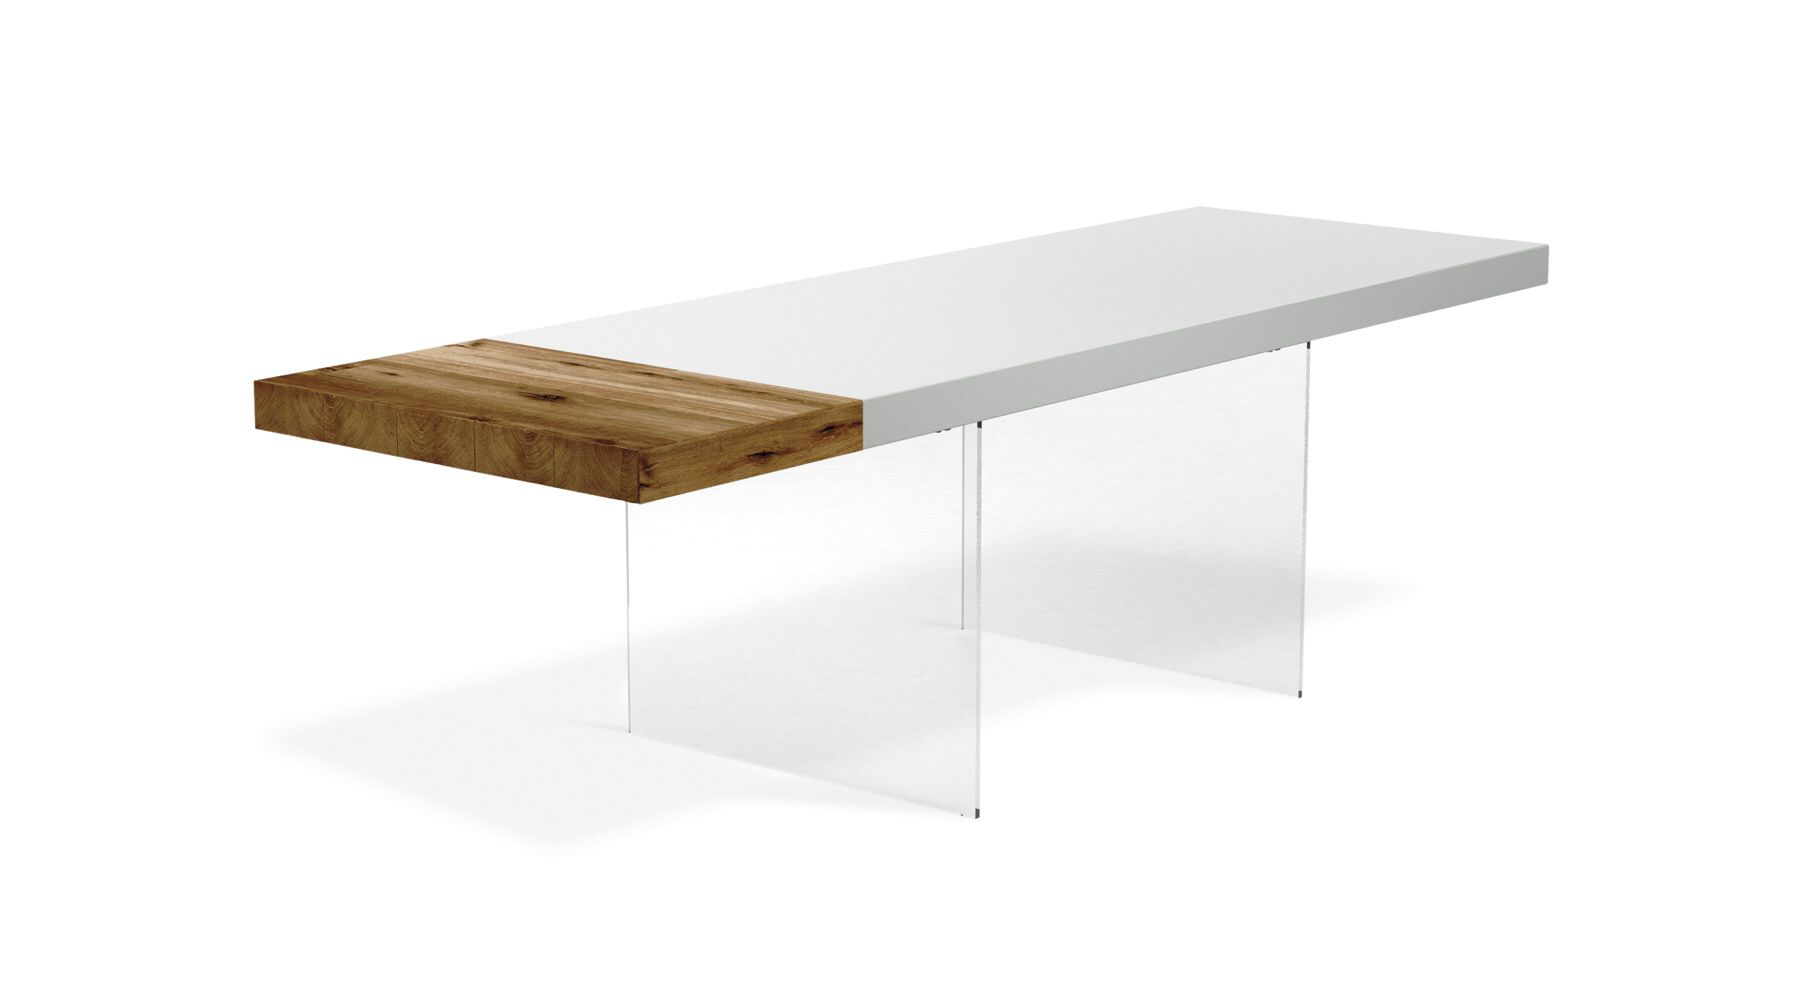 Tavolo Lago ~ Rectangular wooden table air wildwood by lago design daniele lago